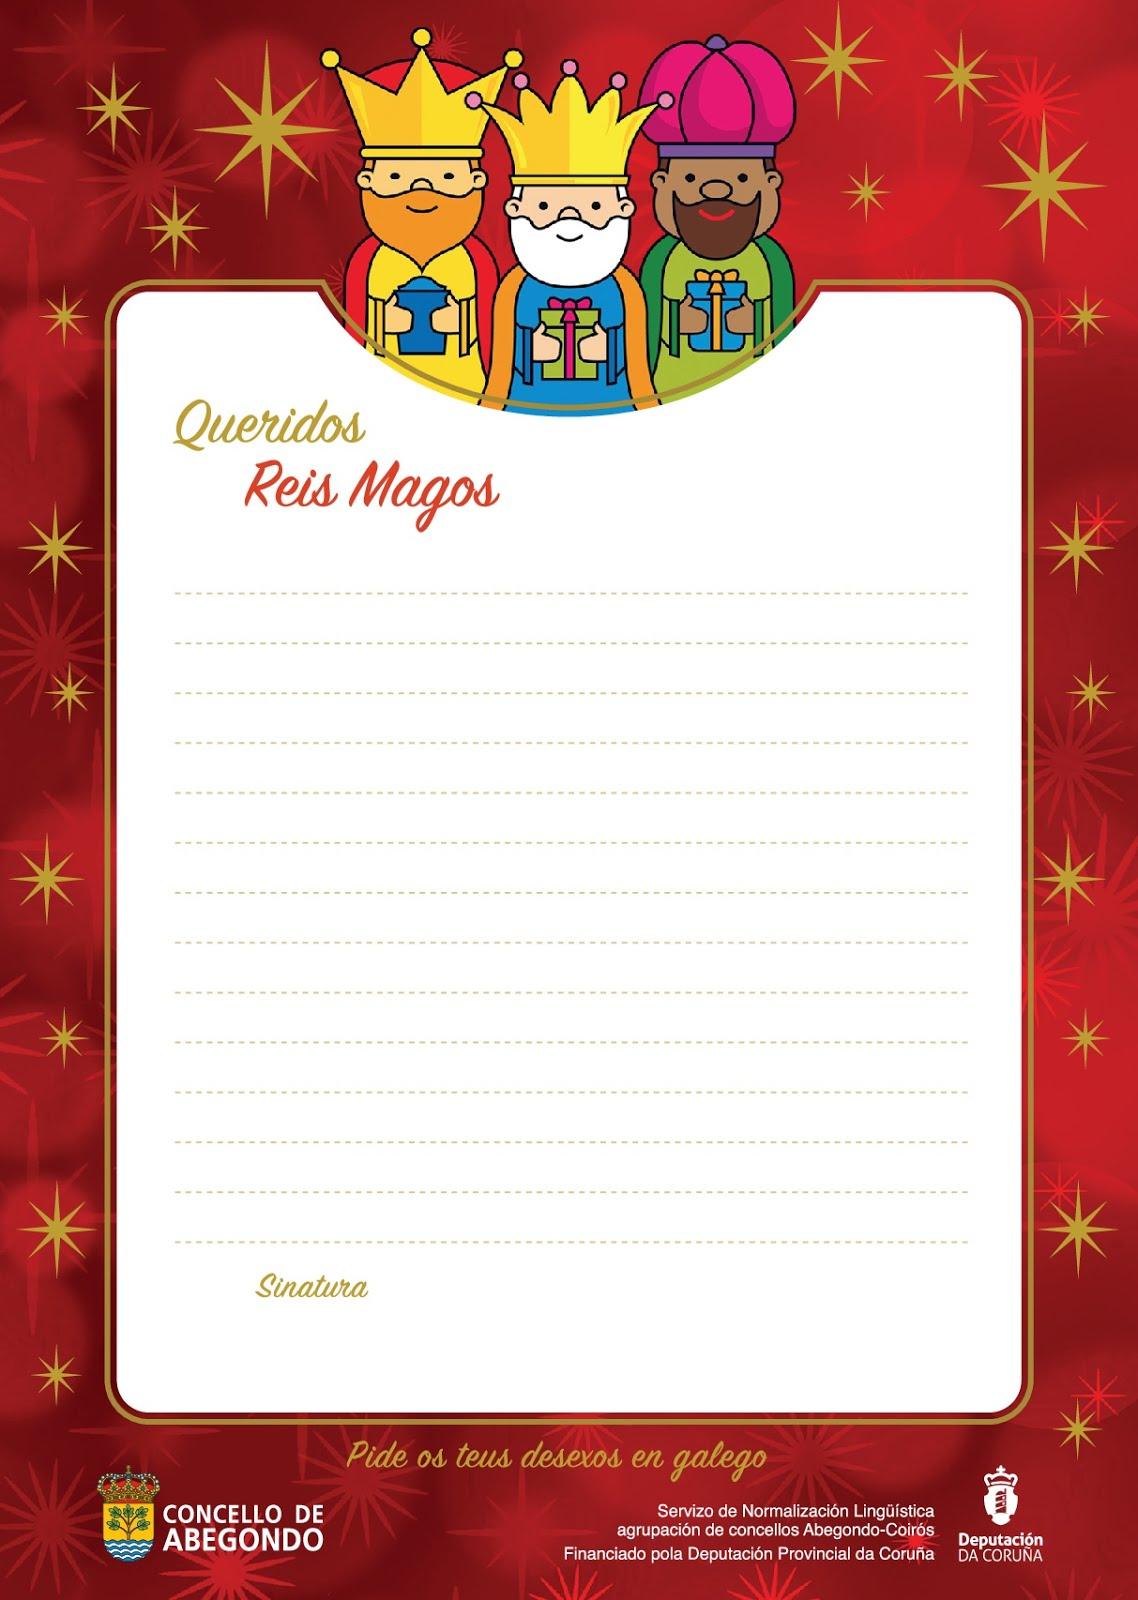 Carta aos Reis Magos